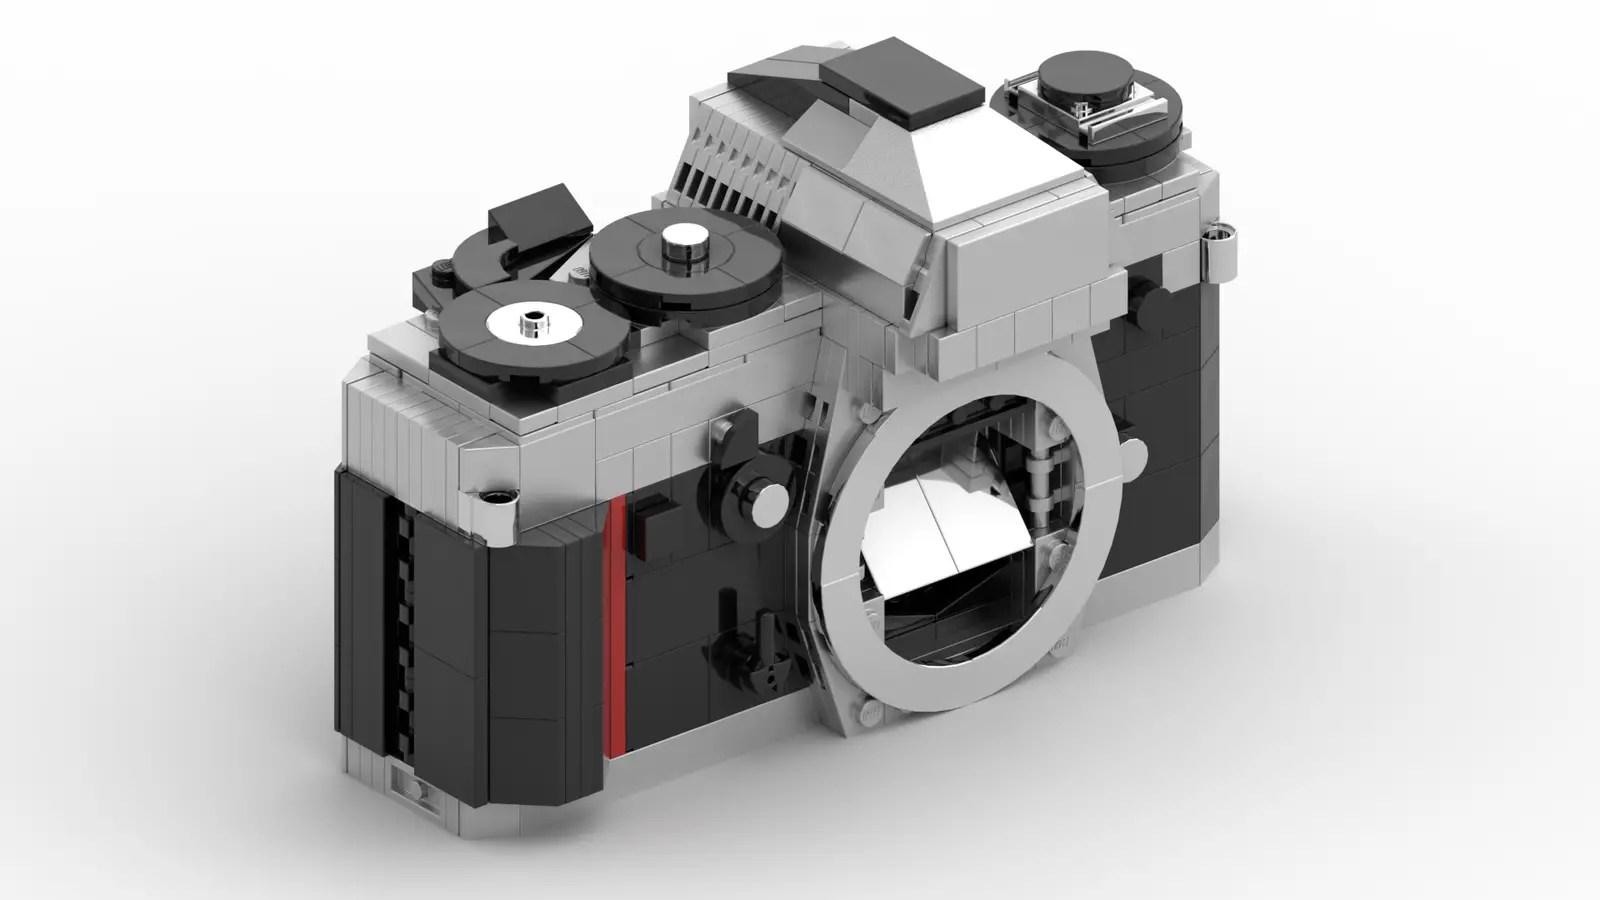 LEGO Nikon F3: Front left (Credit: Ethan Brossard)